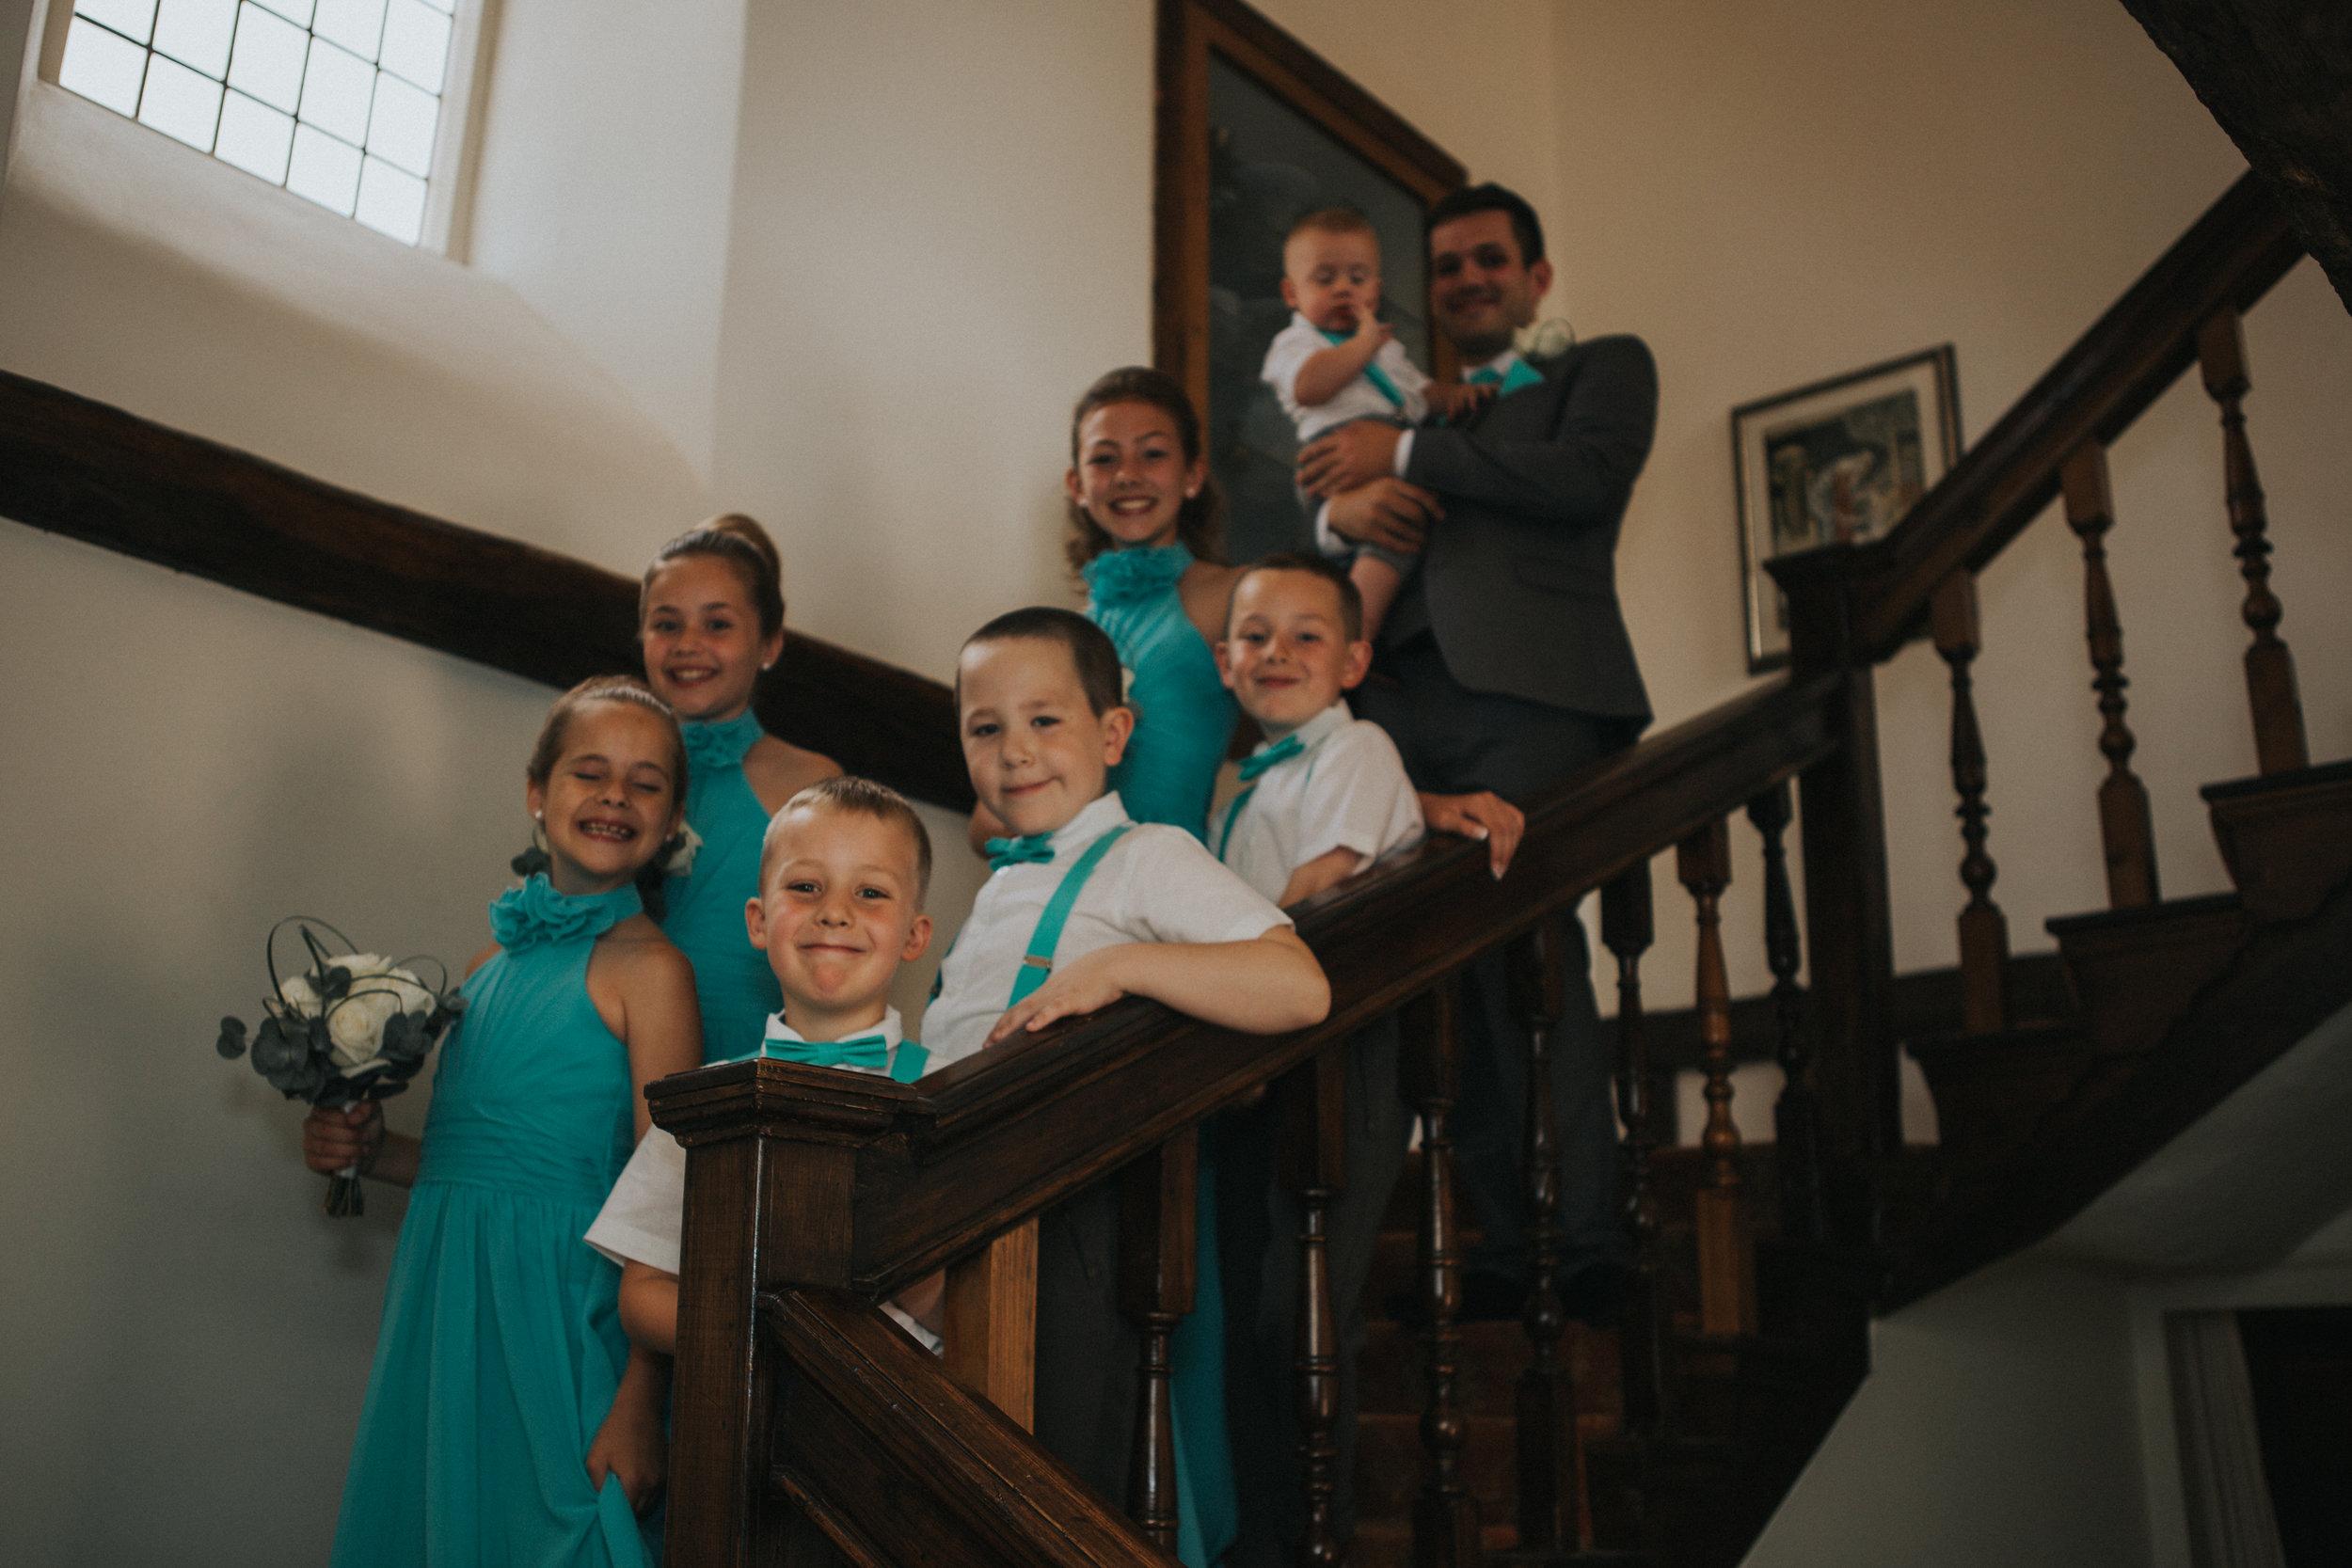 westenhangar-castle-kent-london-wedding-photography-stairs-33